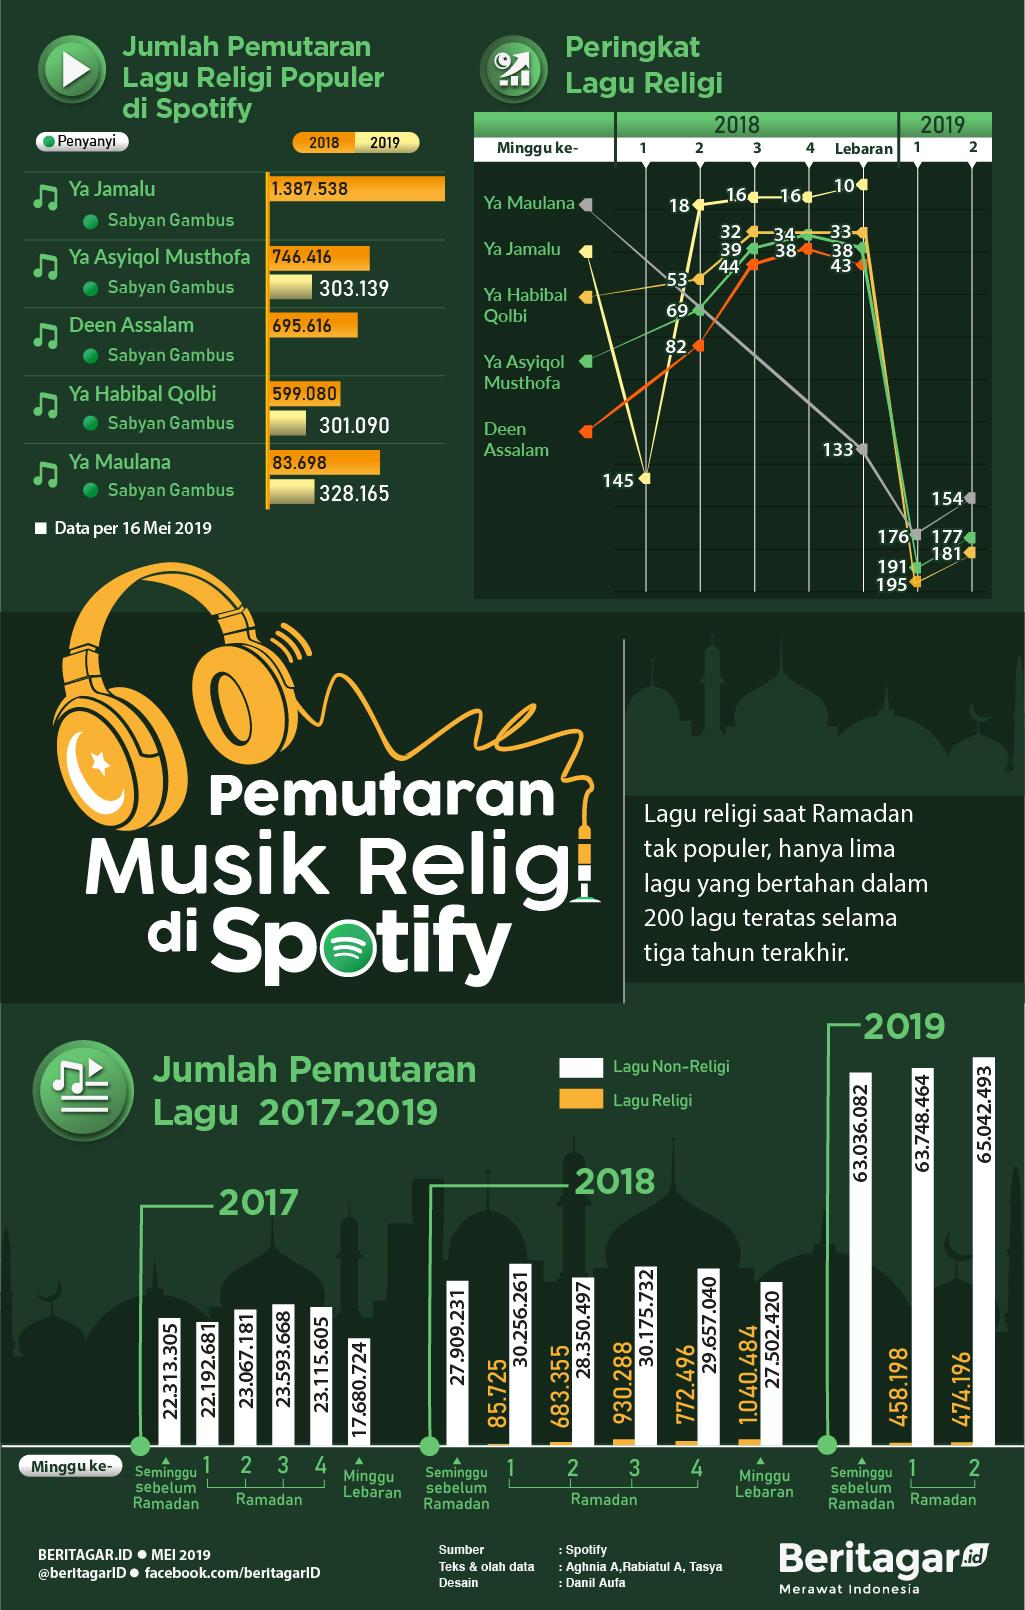 Infografis Musik Religi Spotify 2019